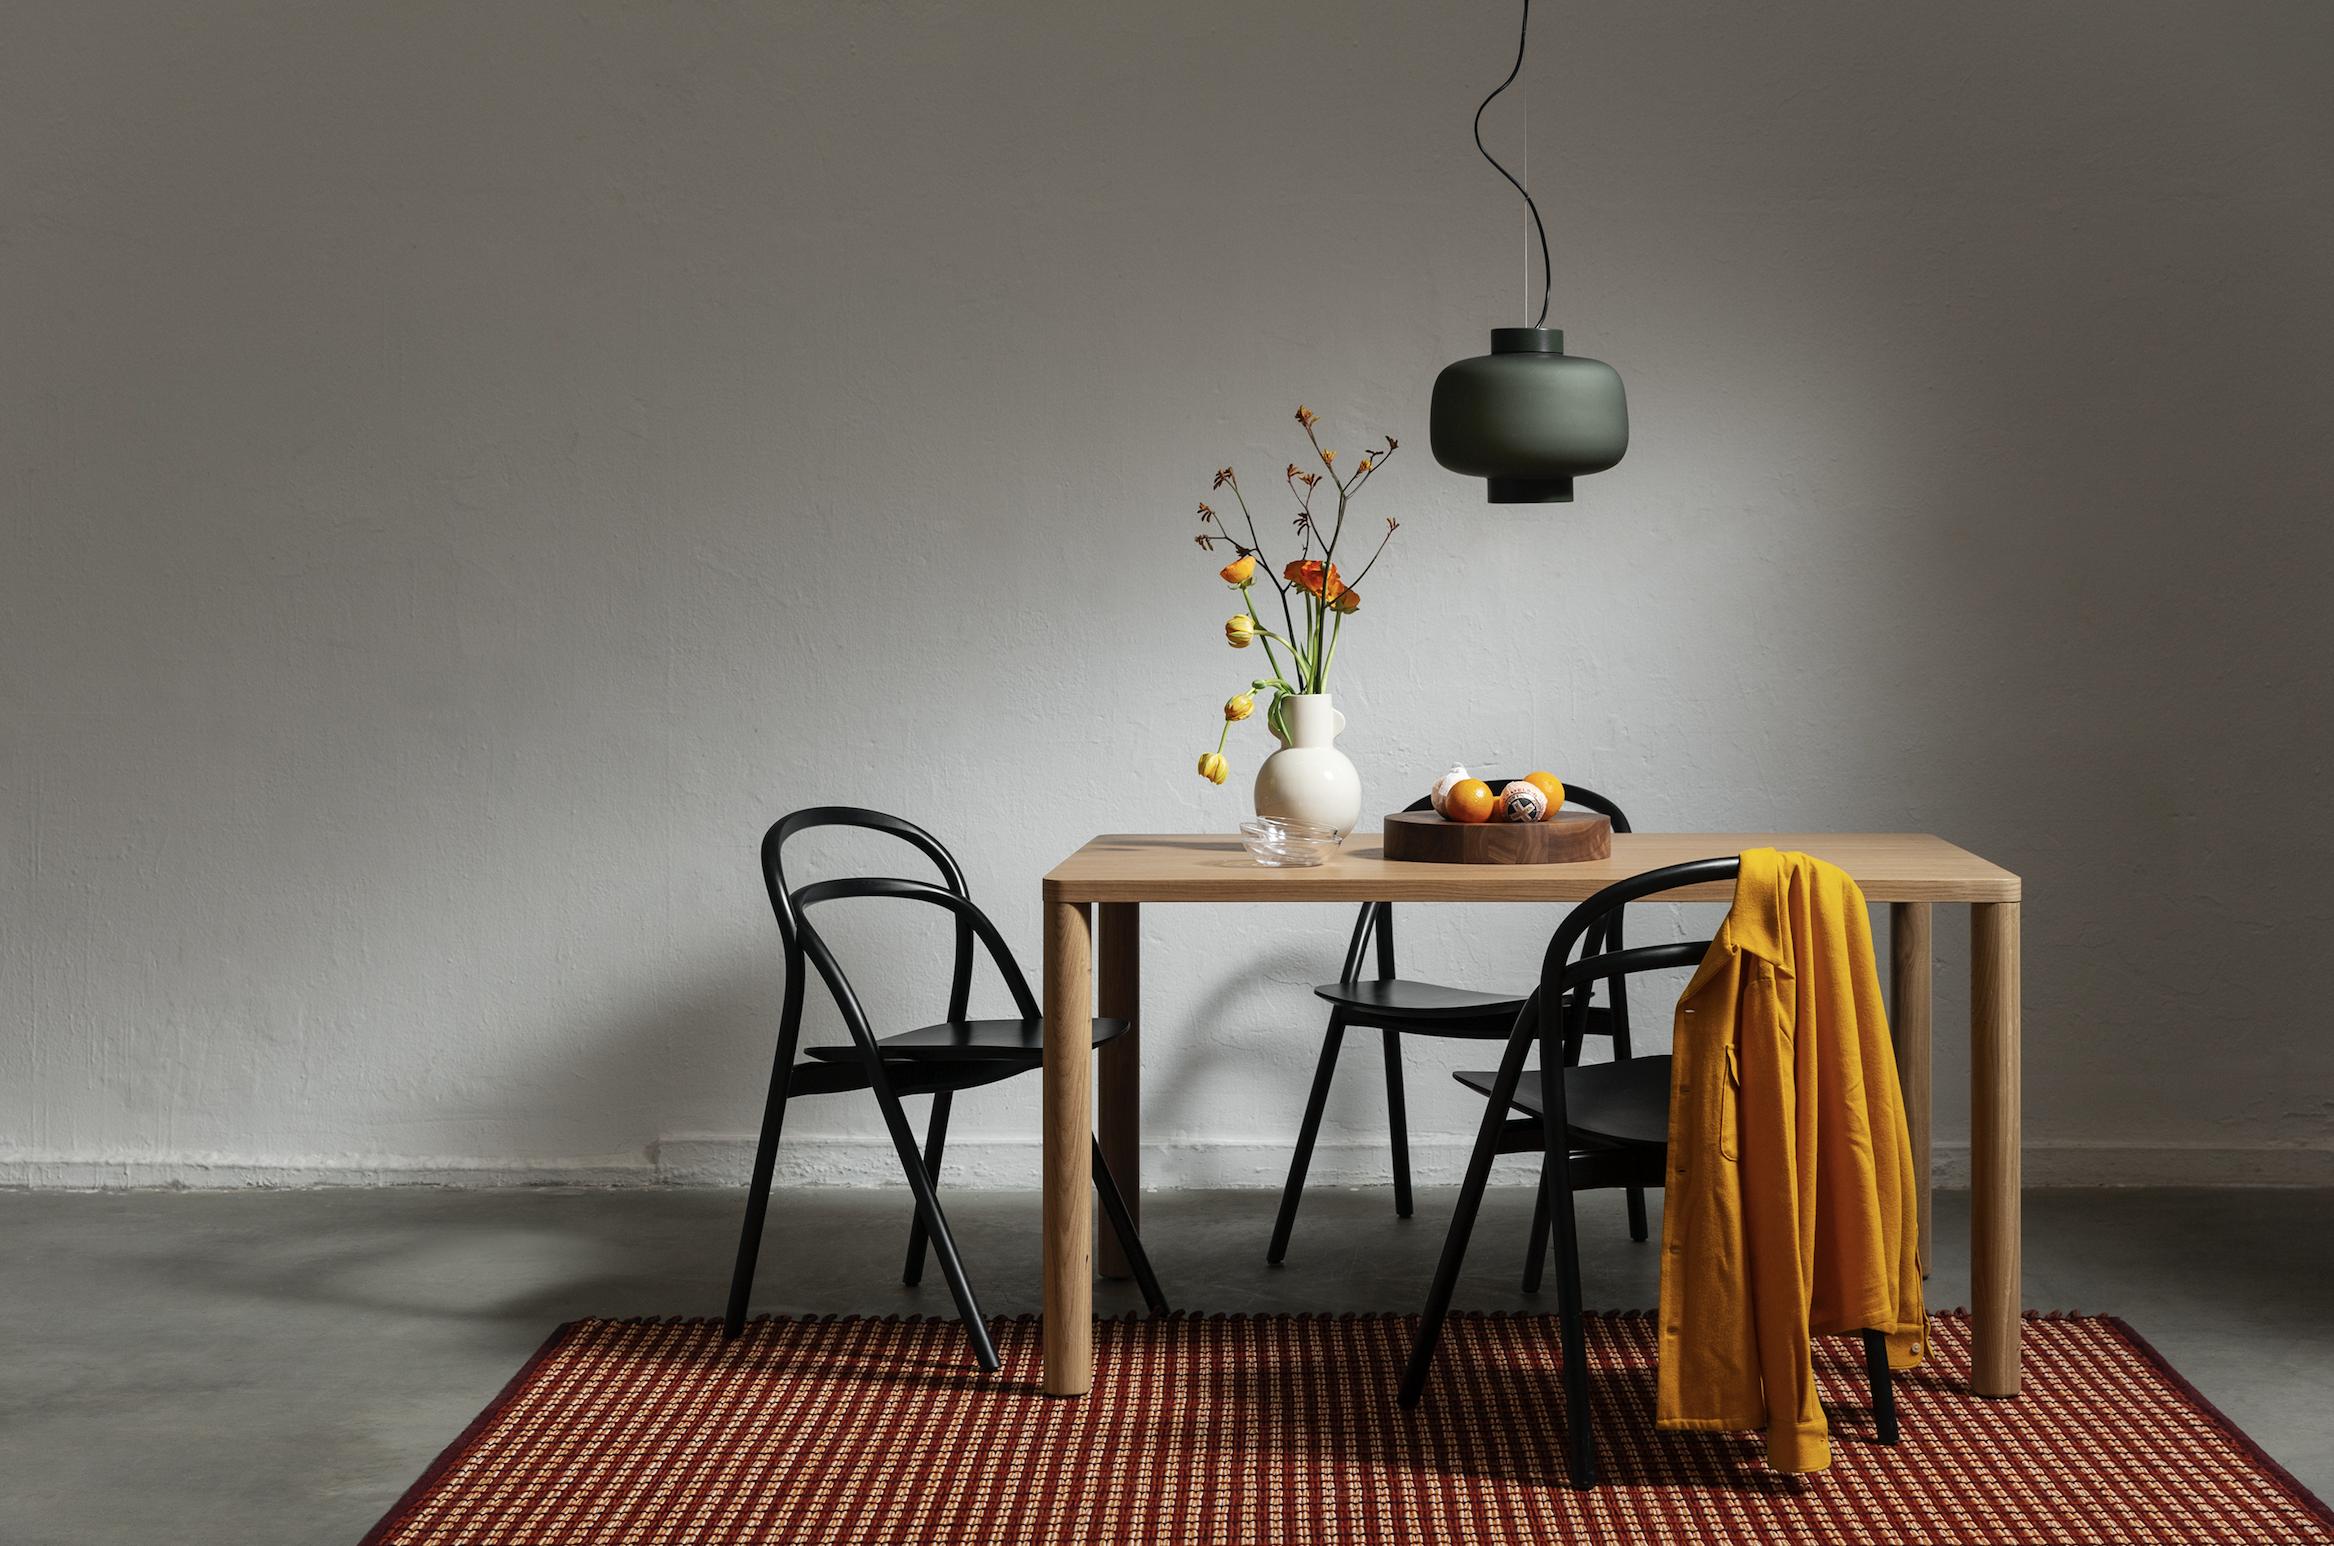 Hem Stockholm Design Week 2019 Rory Robertson Stylist.png